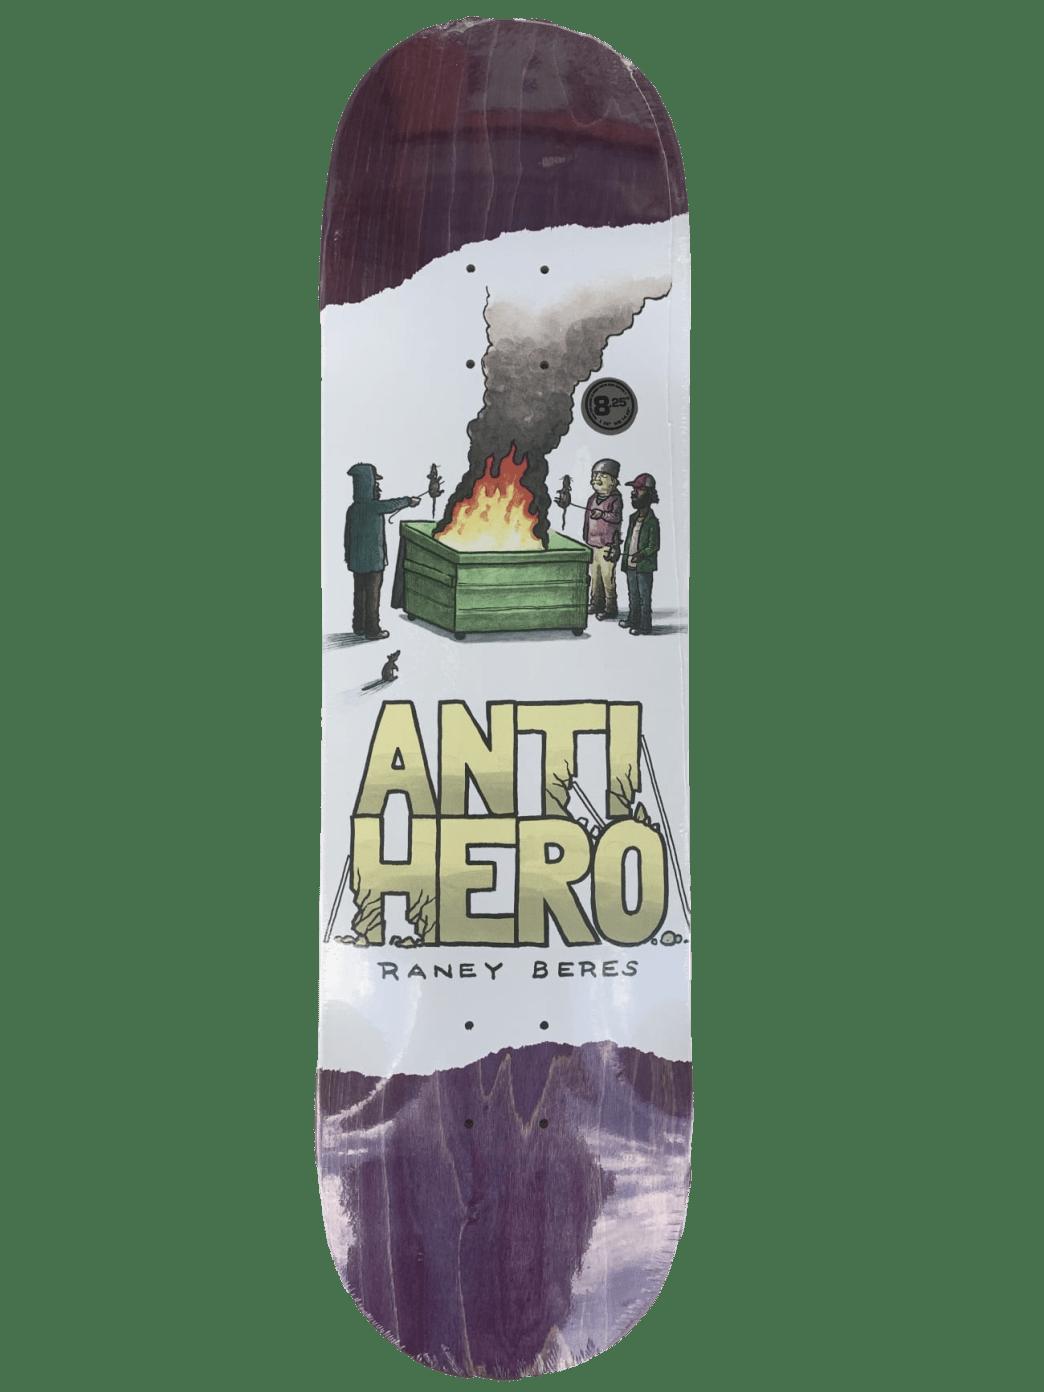 "Antihero Raney Beres Expressions Skateboard Deck - 8.25"" | Deck by Antihero Skateboards 1"